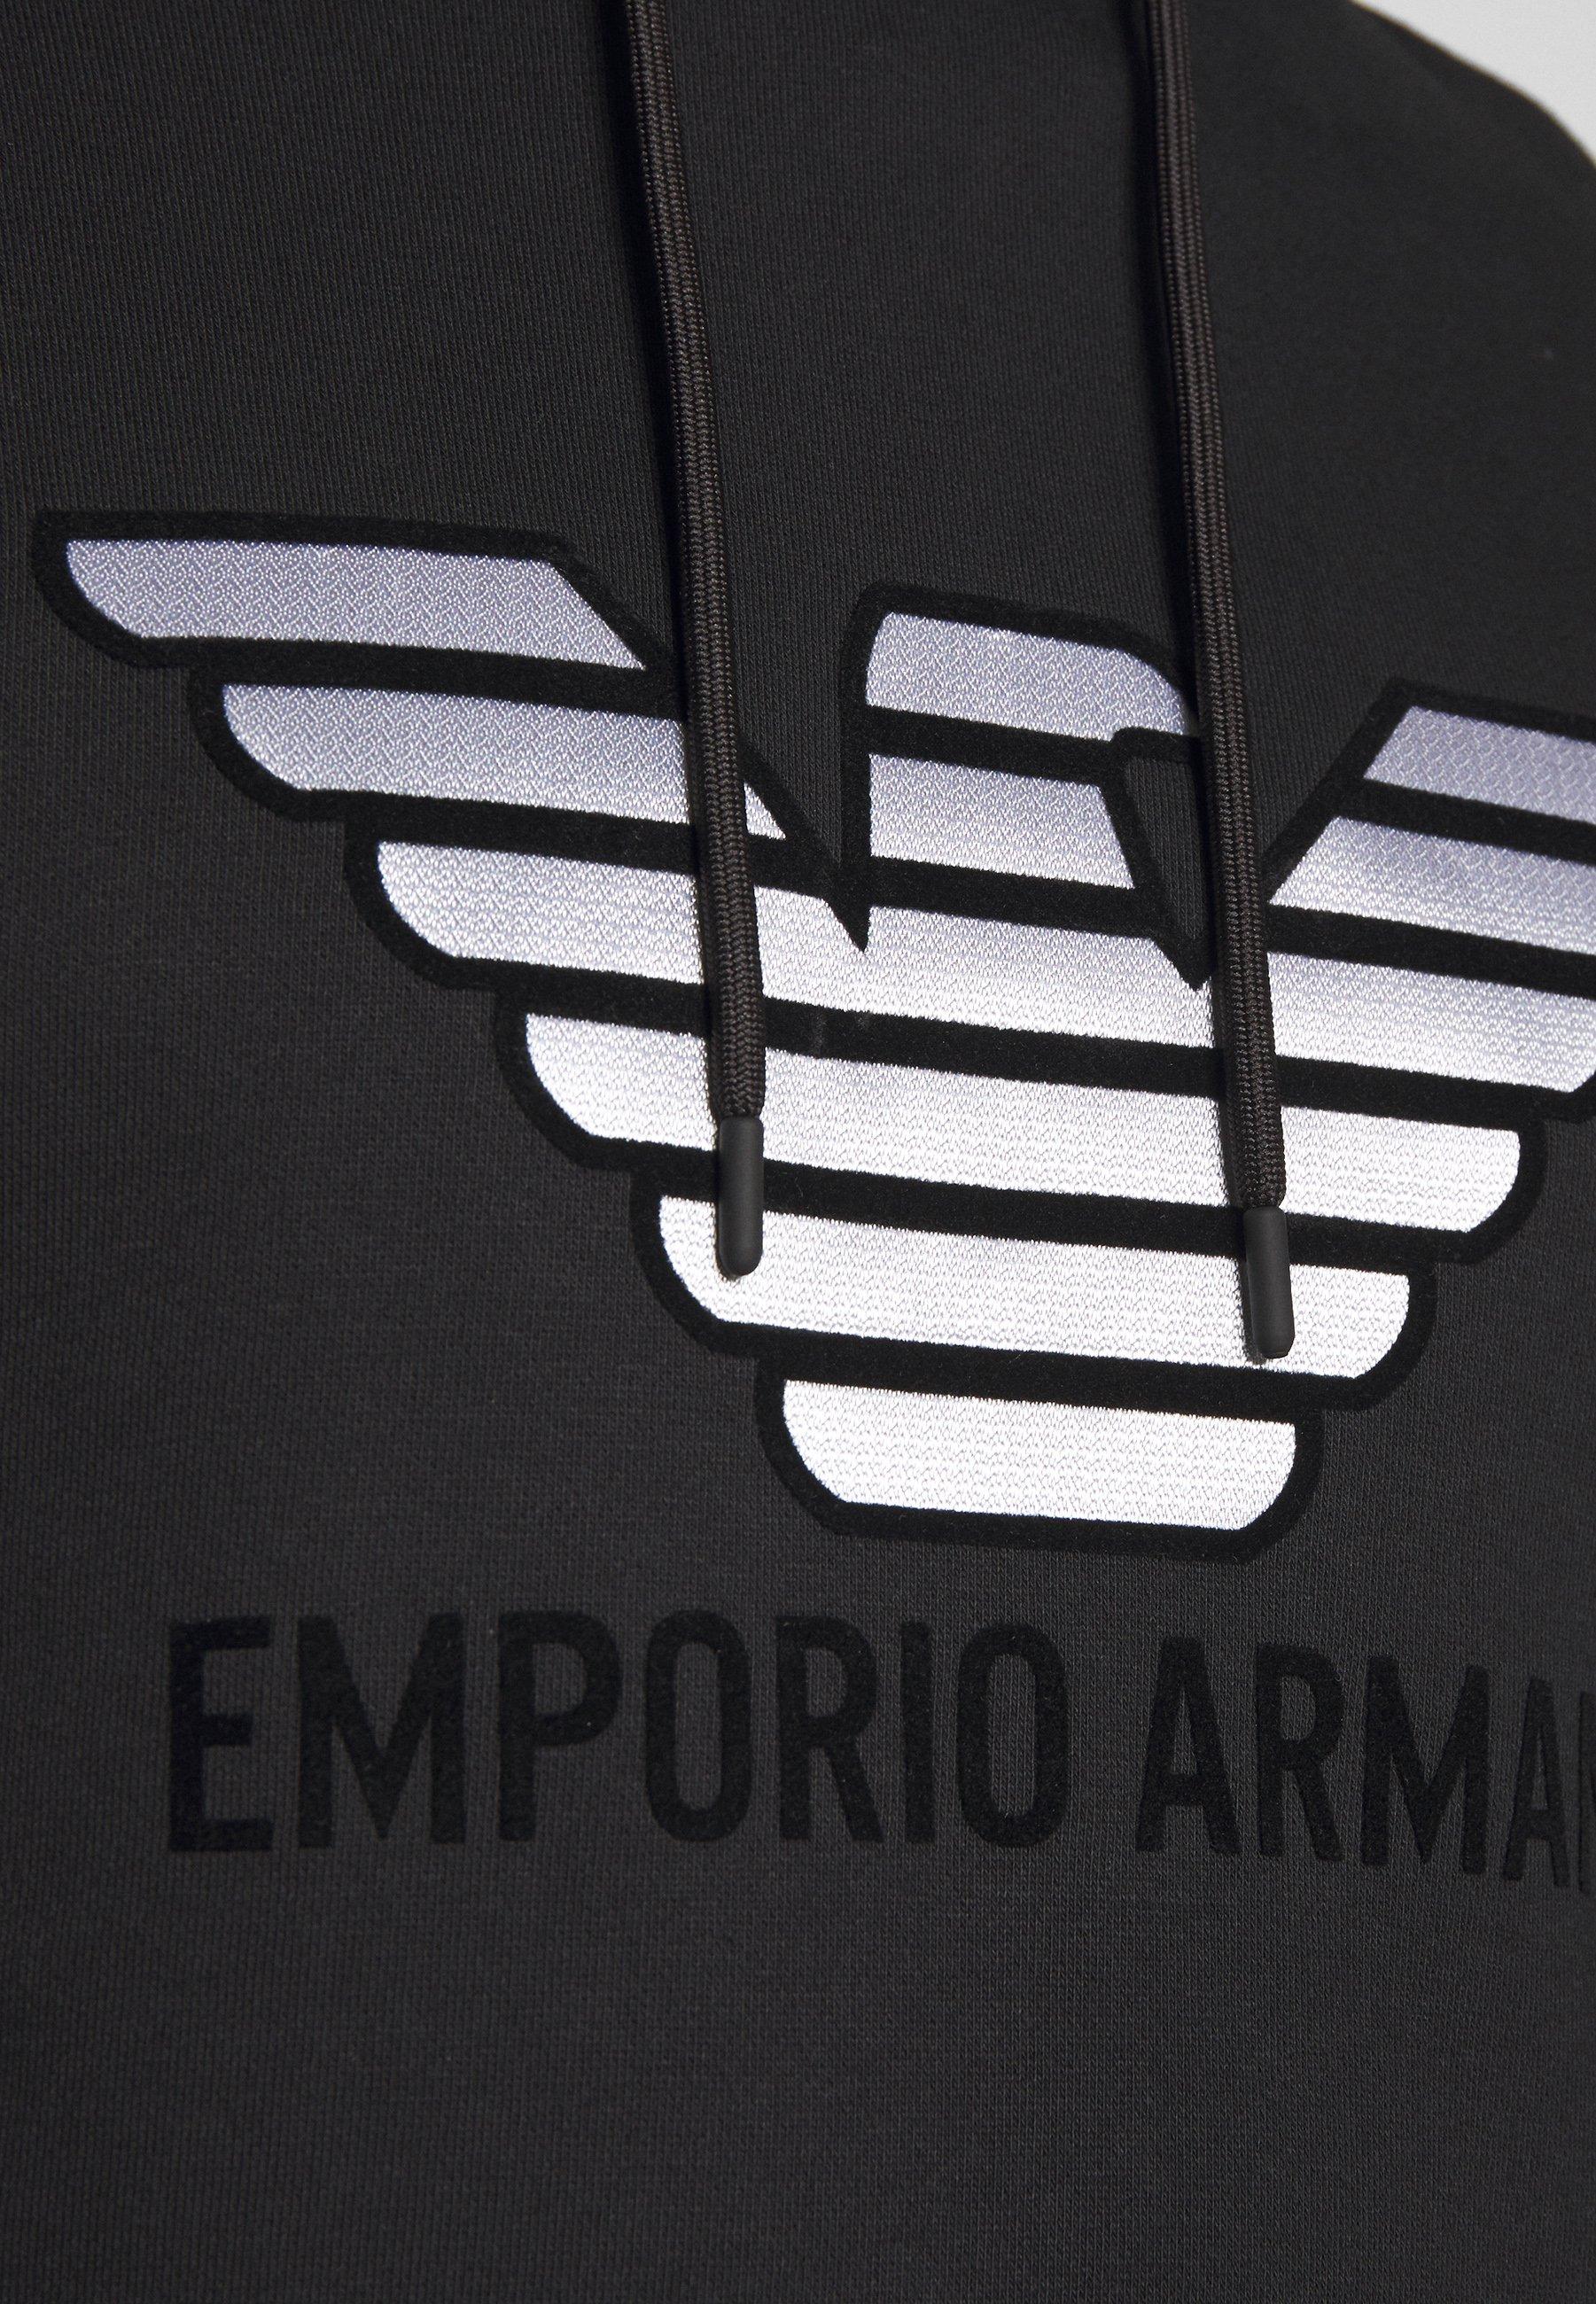 Emporio Armani Felpa - Luvtröja Nero